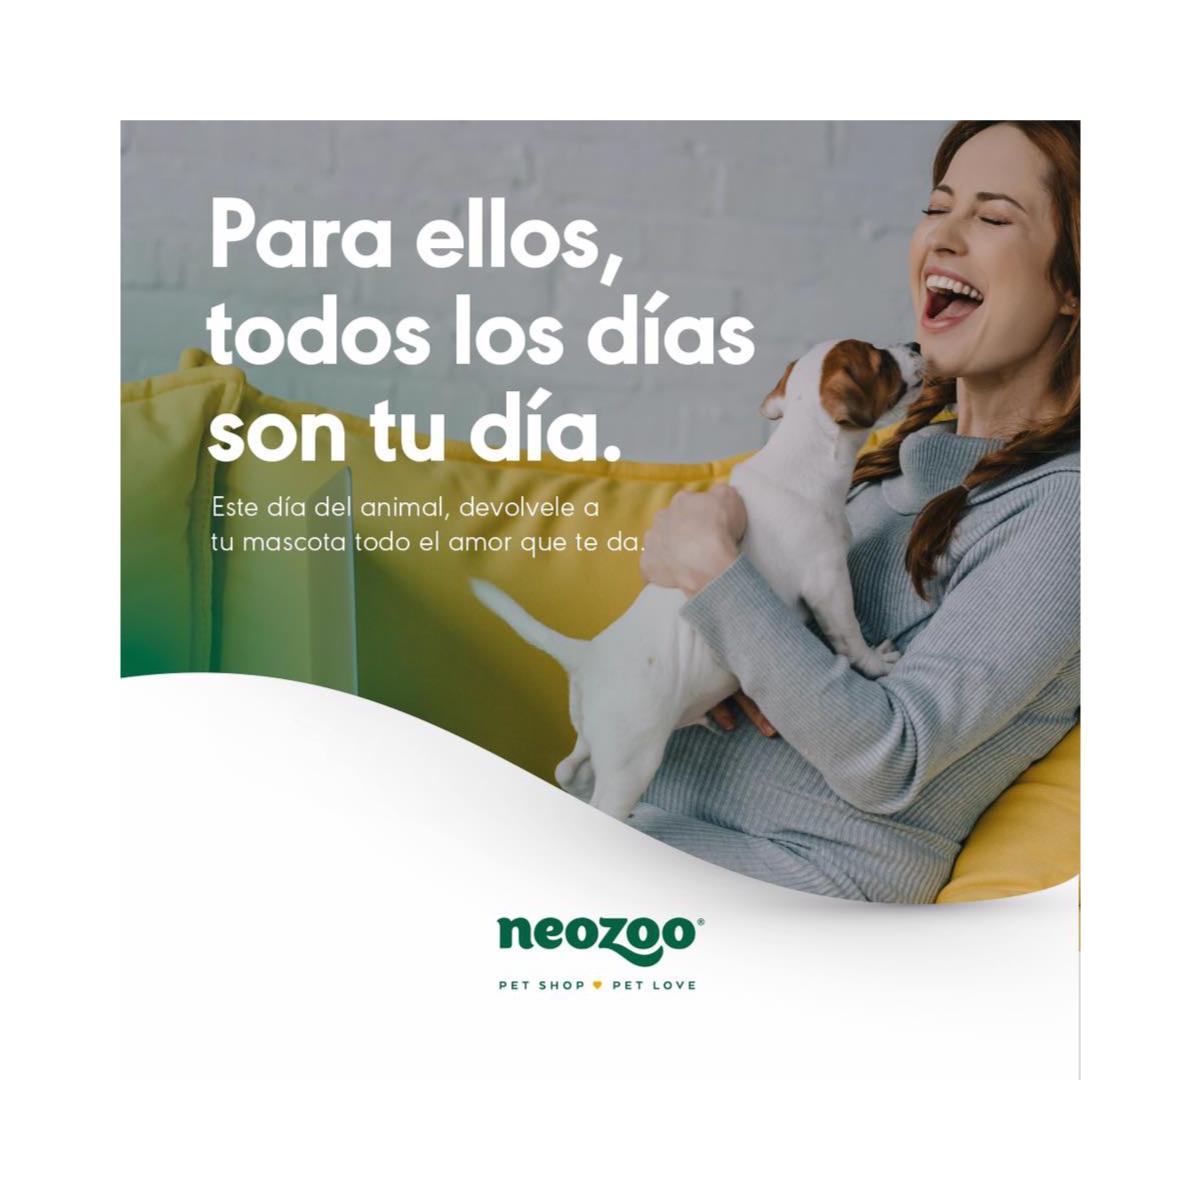 NEO ZOO - TIENDA DE MASCOTAS